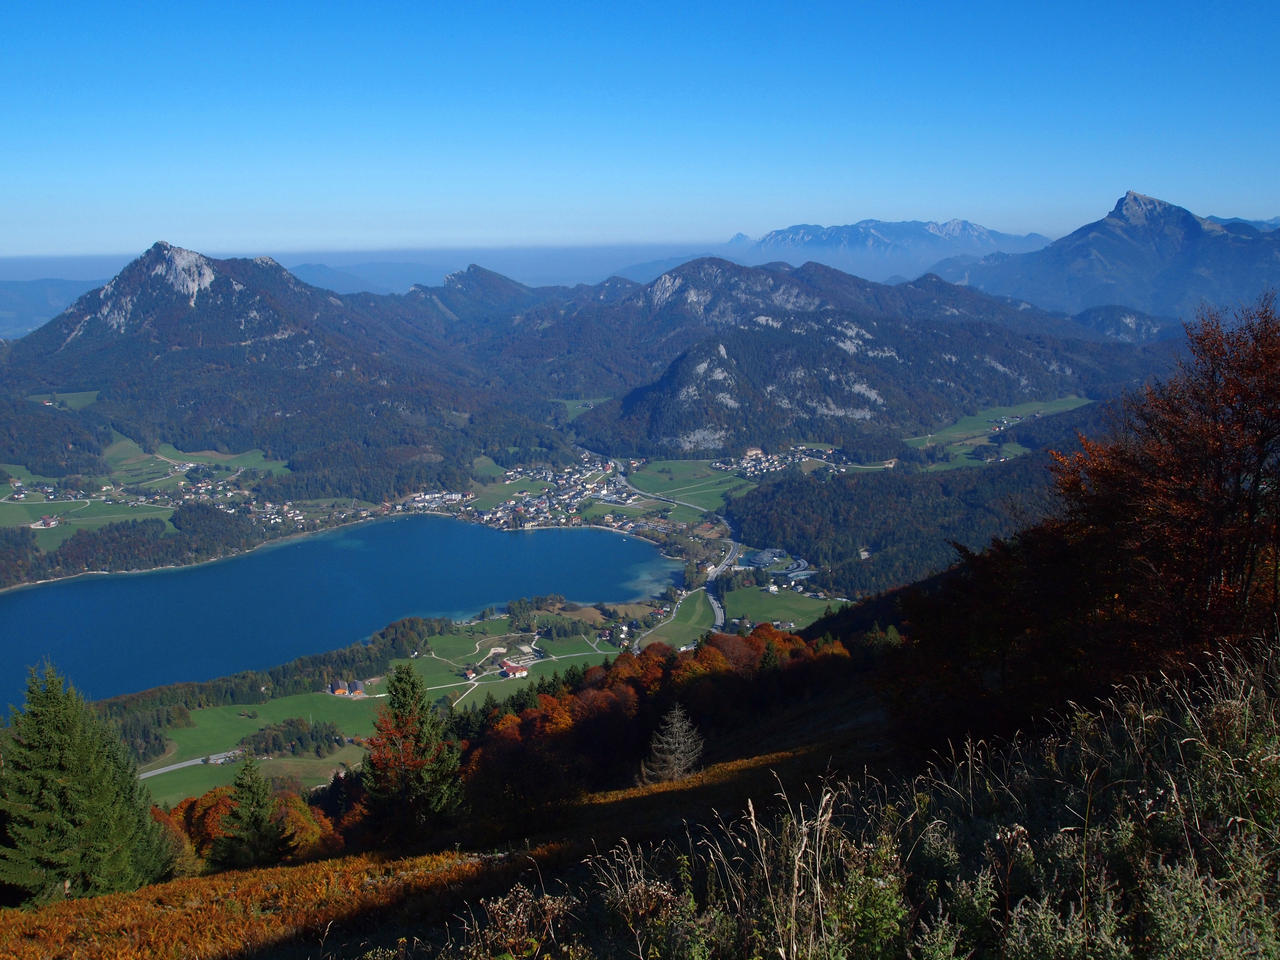 Austrian landscape by Burtn